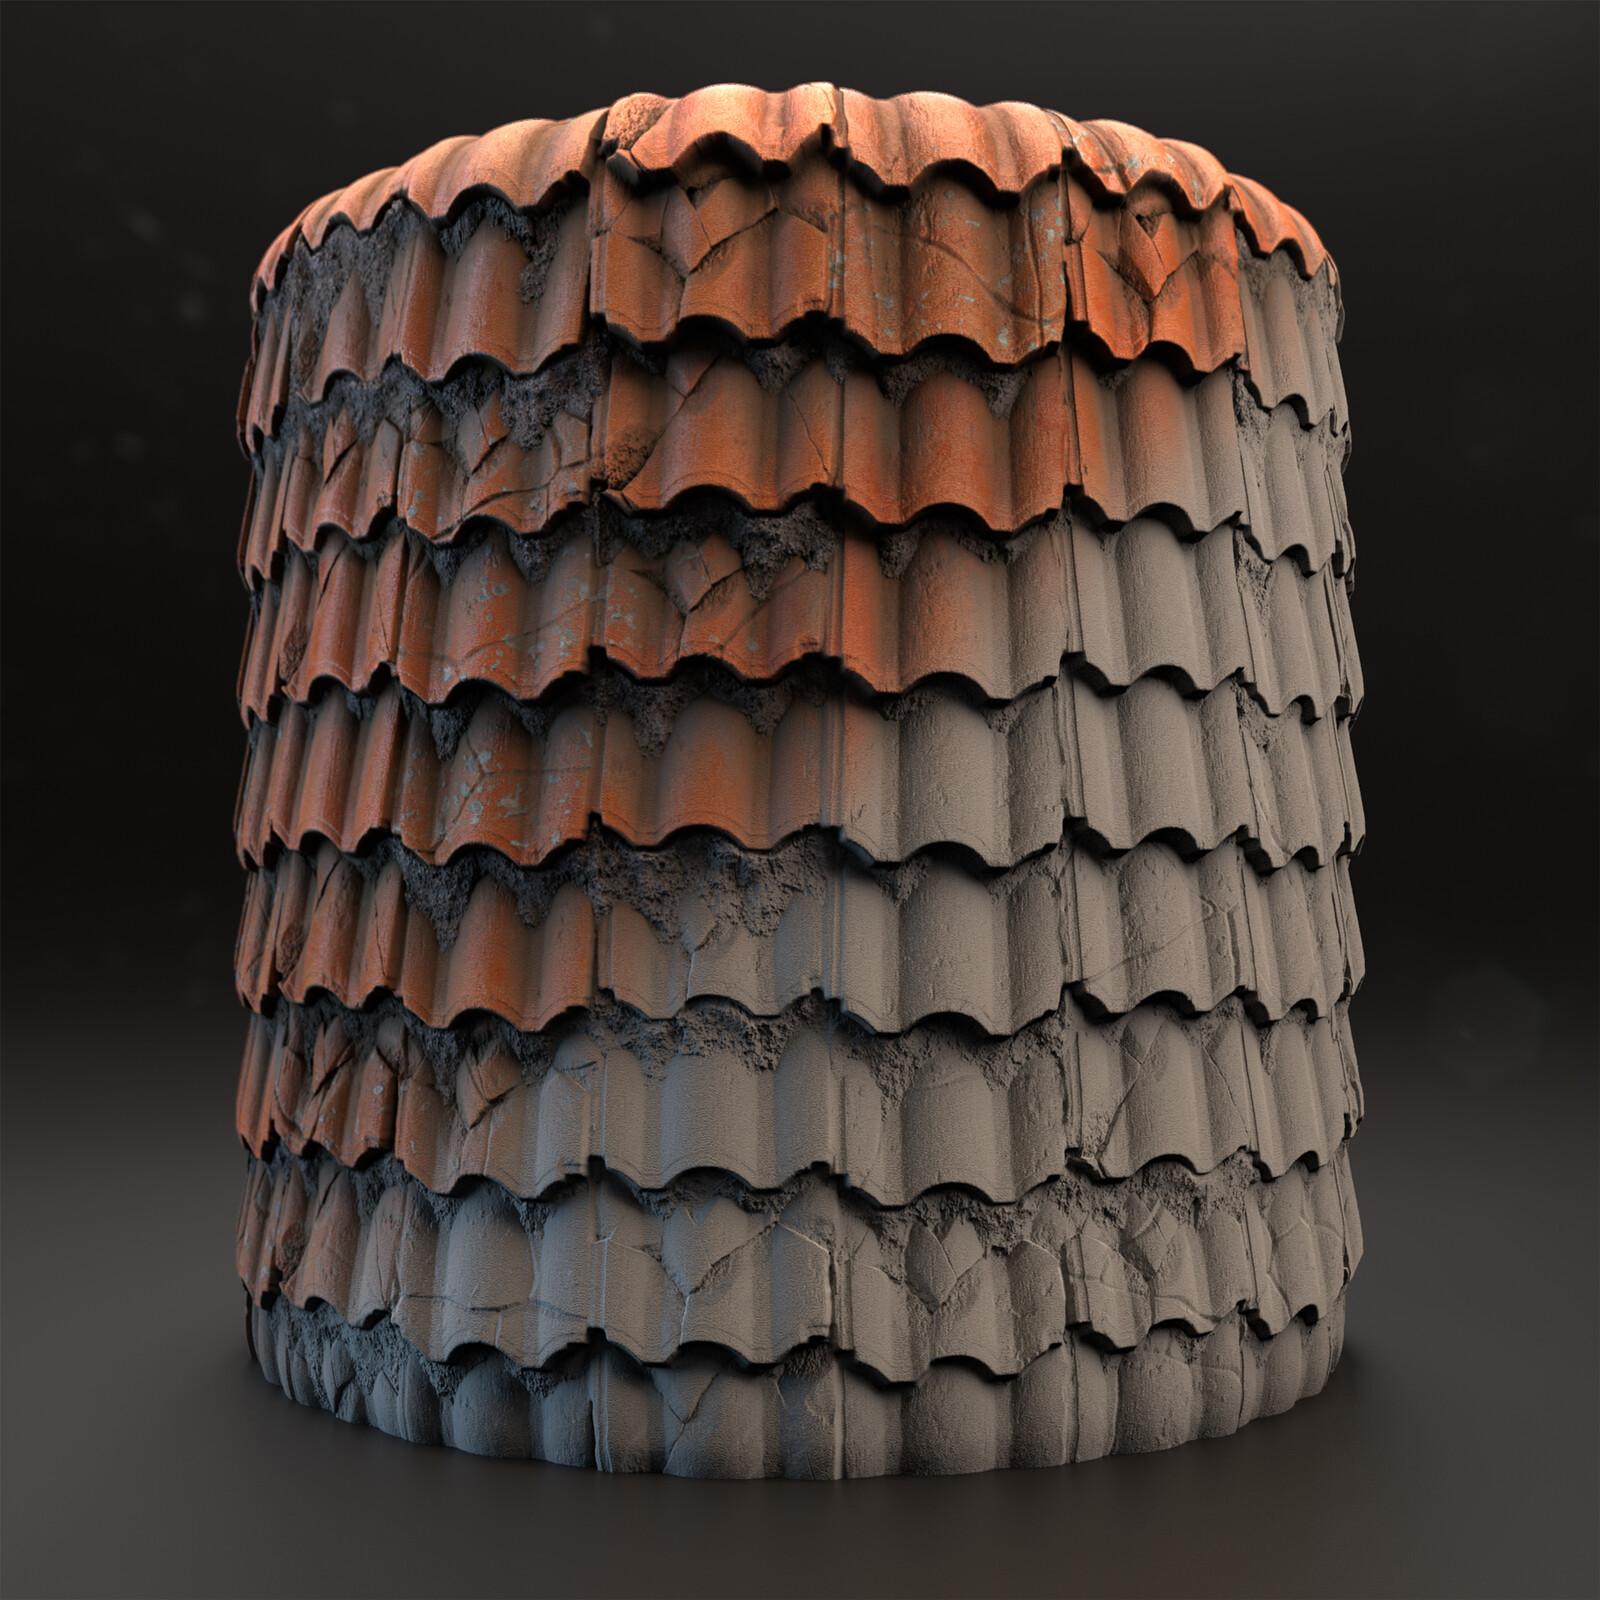 Procedural Roof Tiles Material